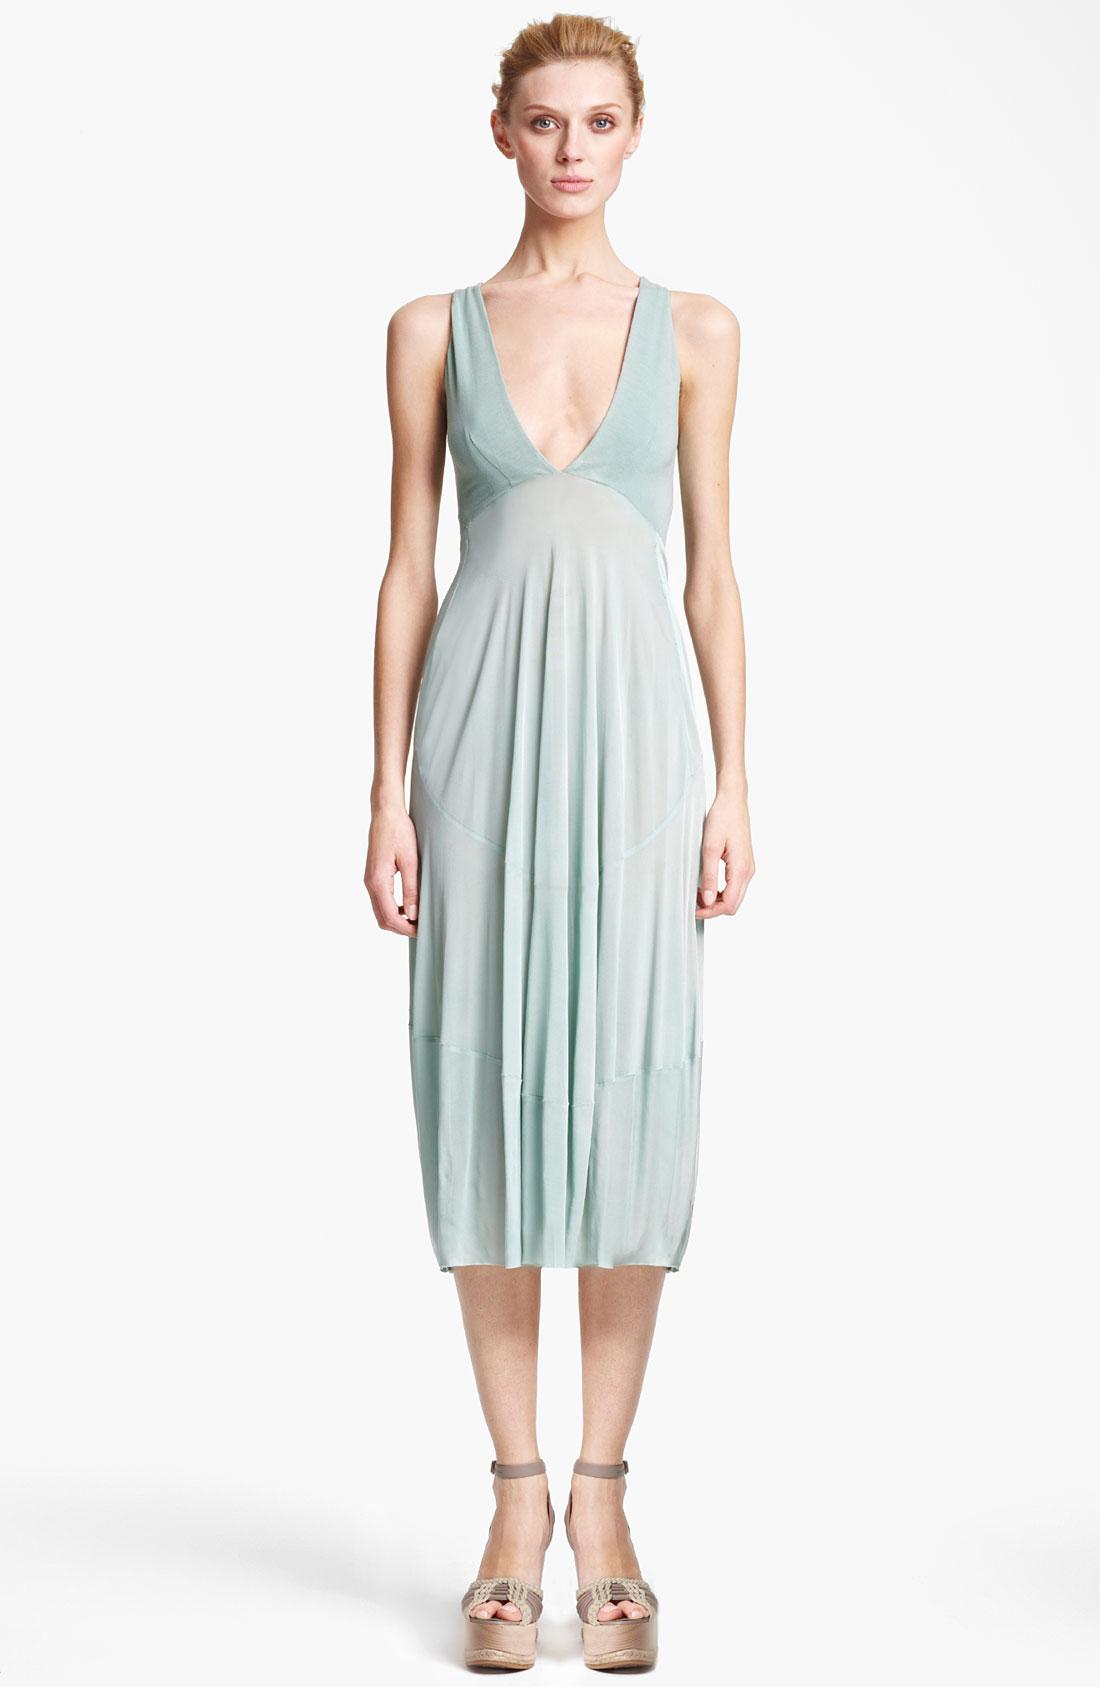 Donna karan new york collection jersey crepe dress in blue for Donna karan new york